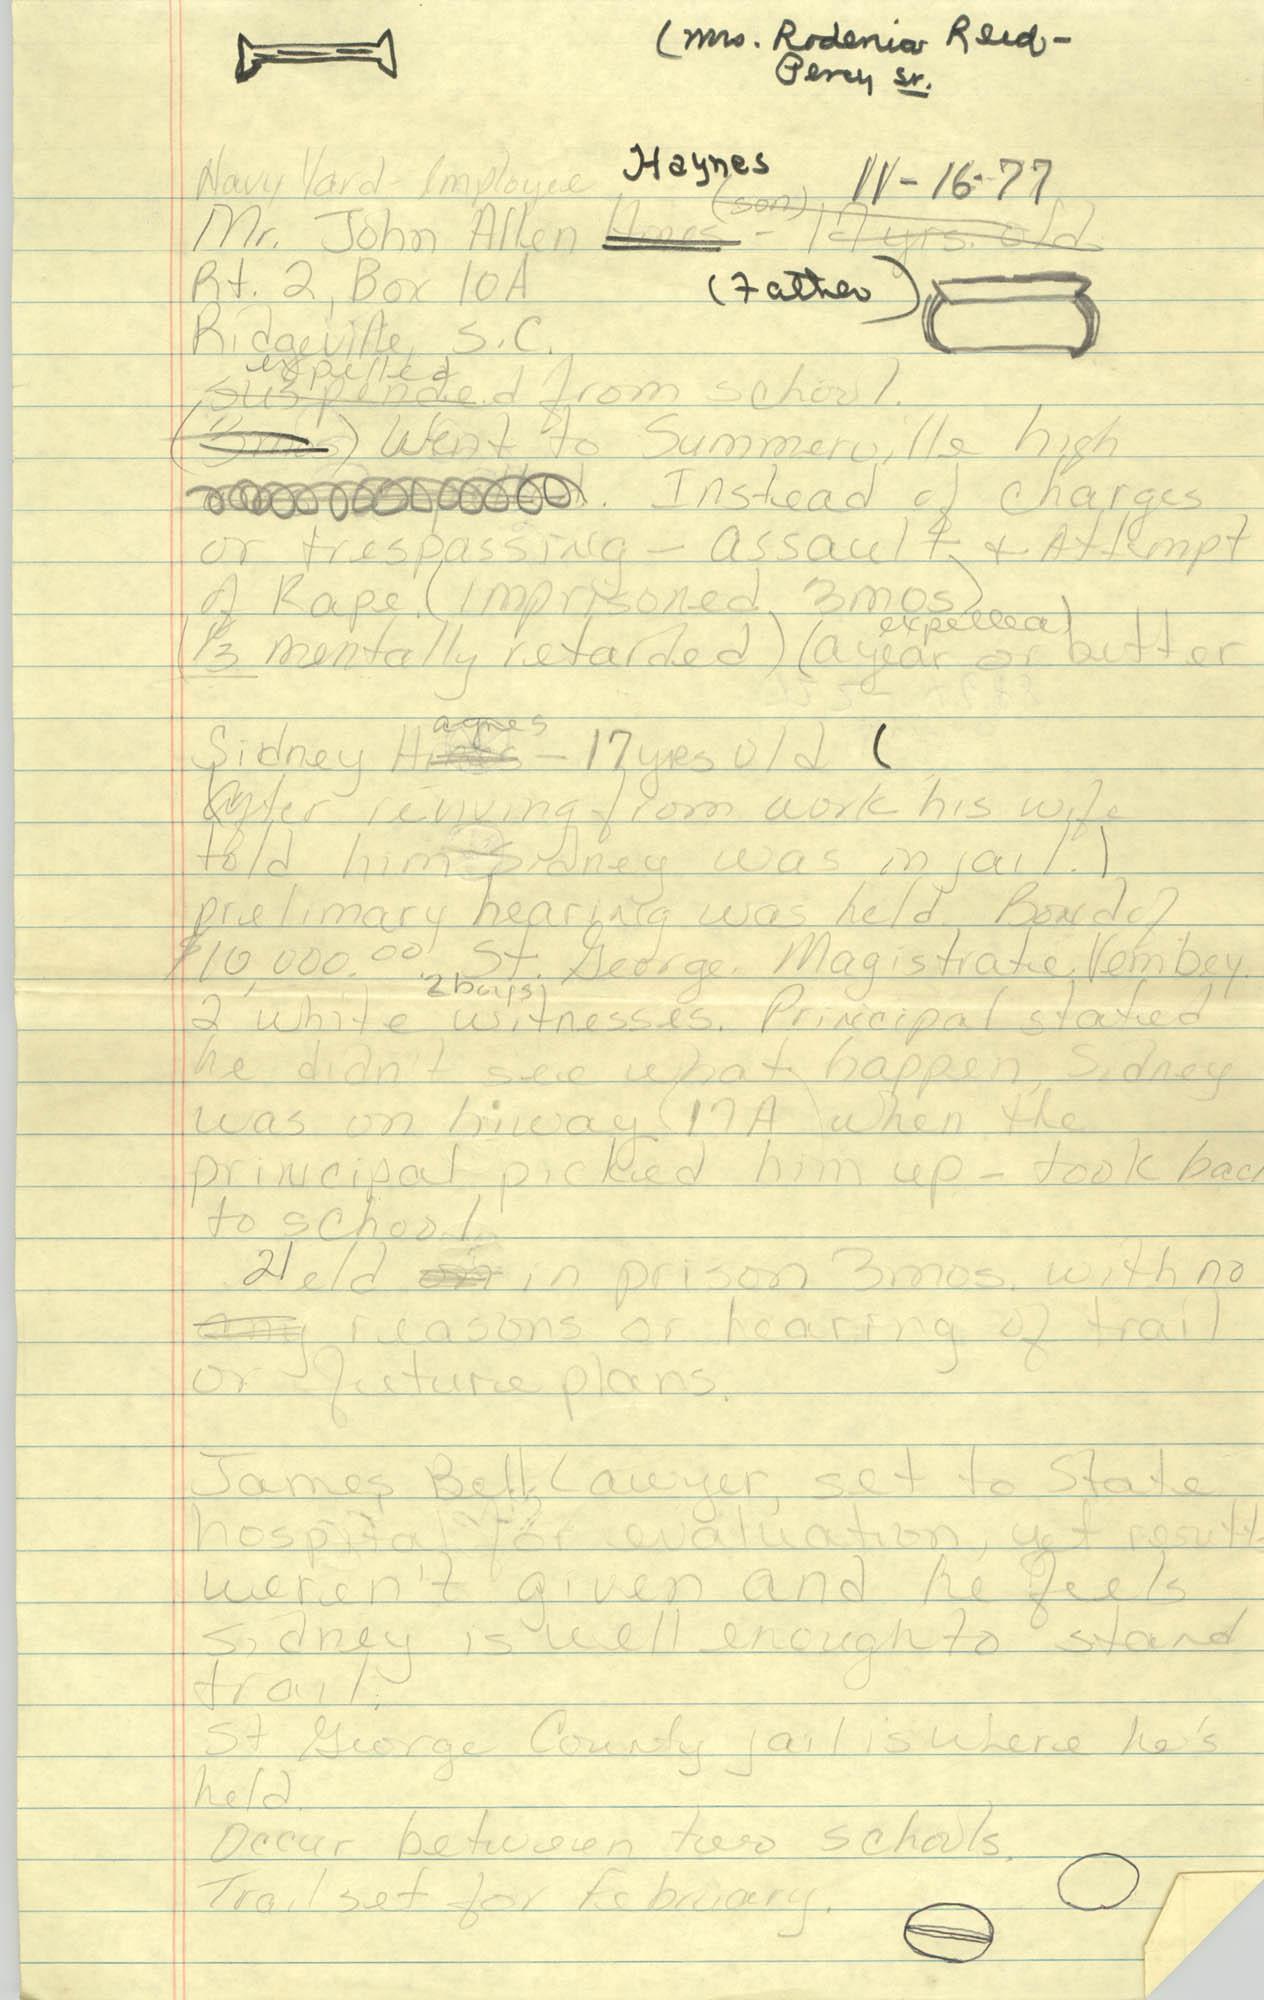 Handwritten COBRA Notes, November 16, 1977